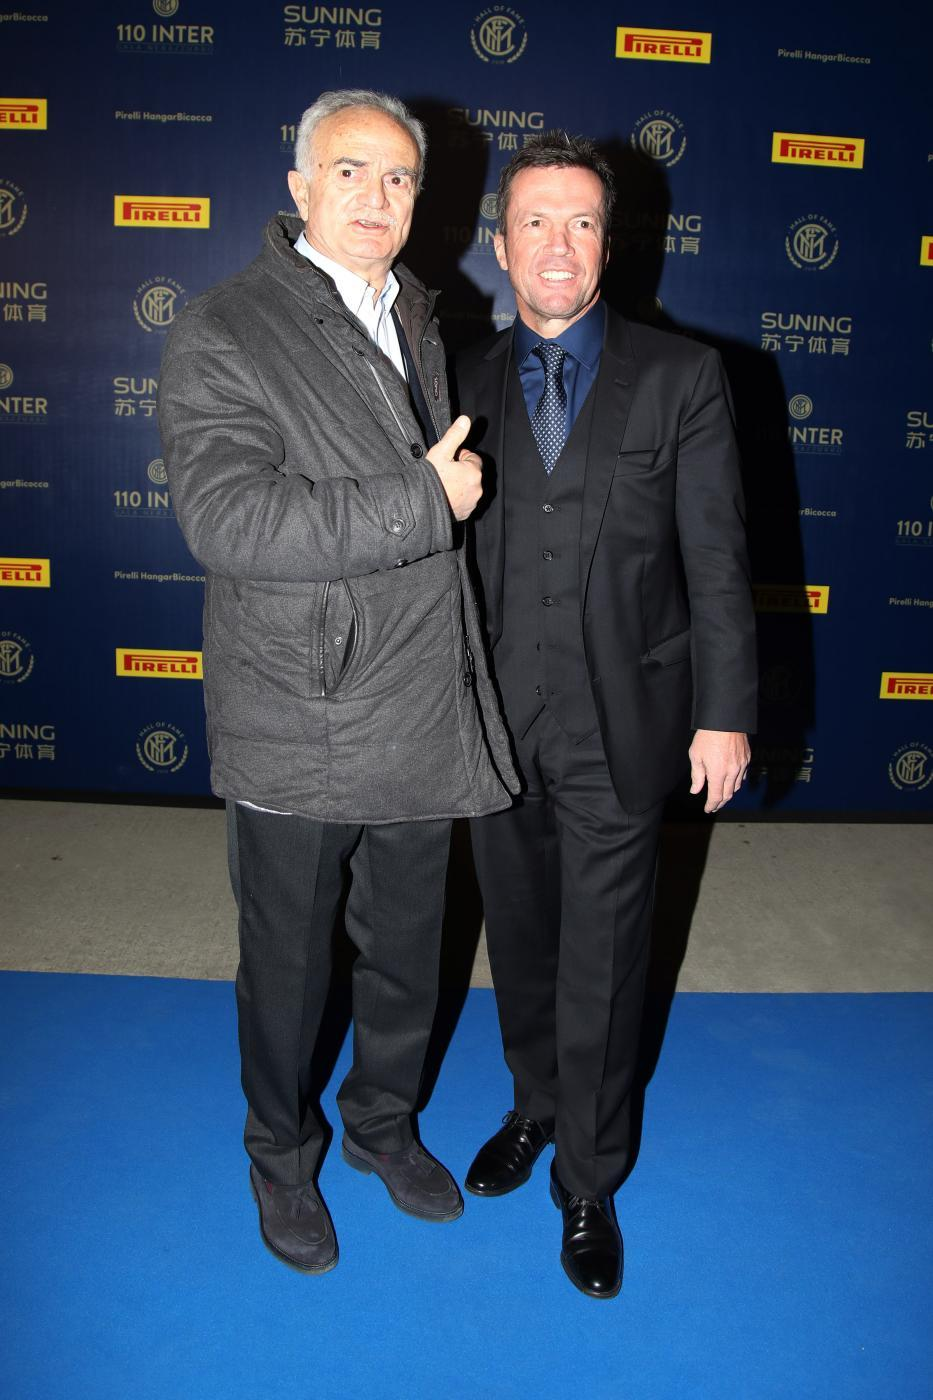 Sandro Mazzola e Lothar Matthaeus